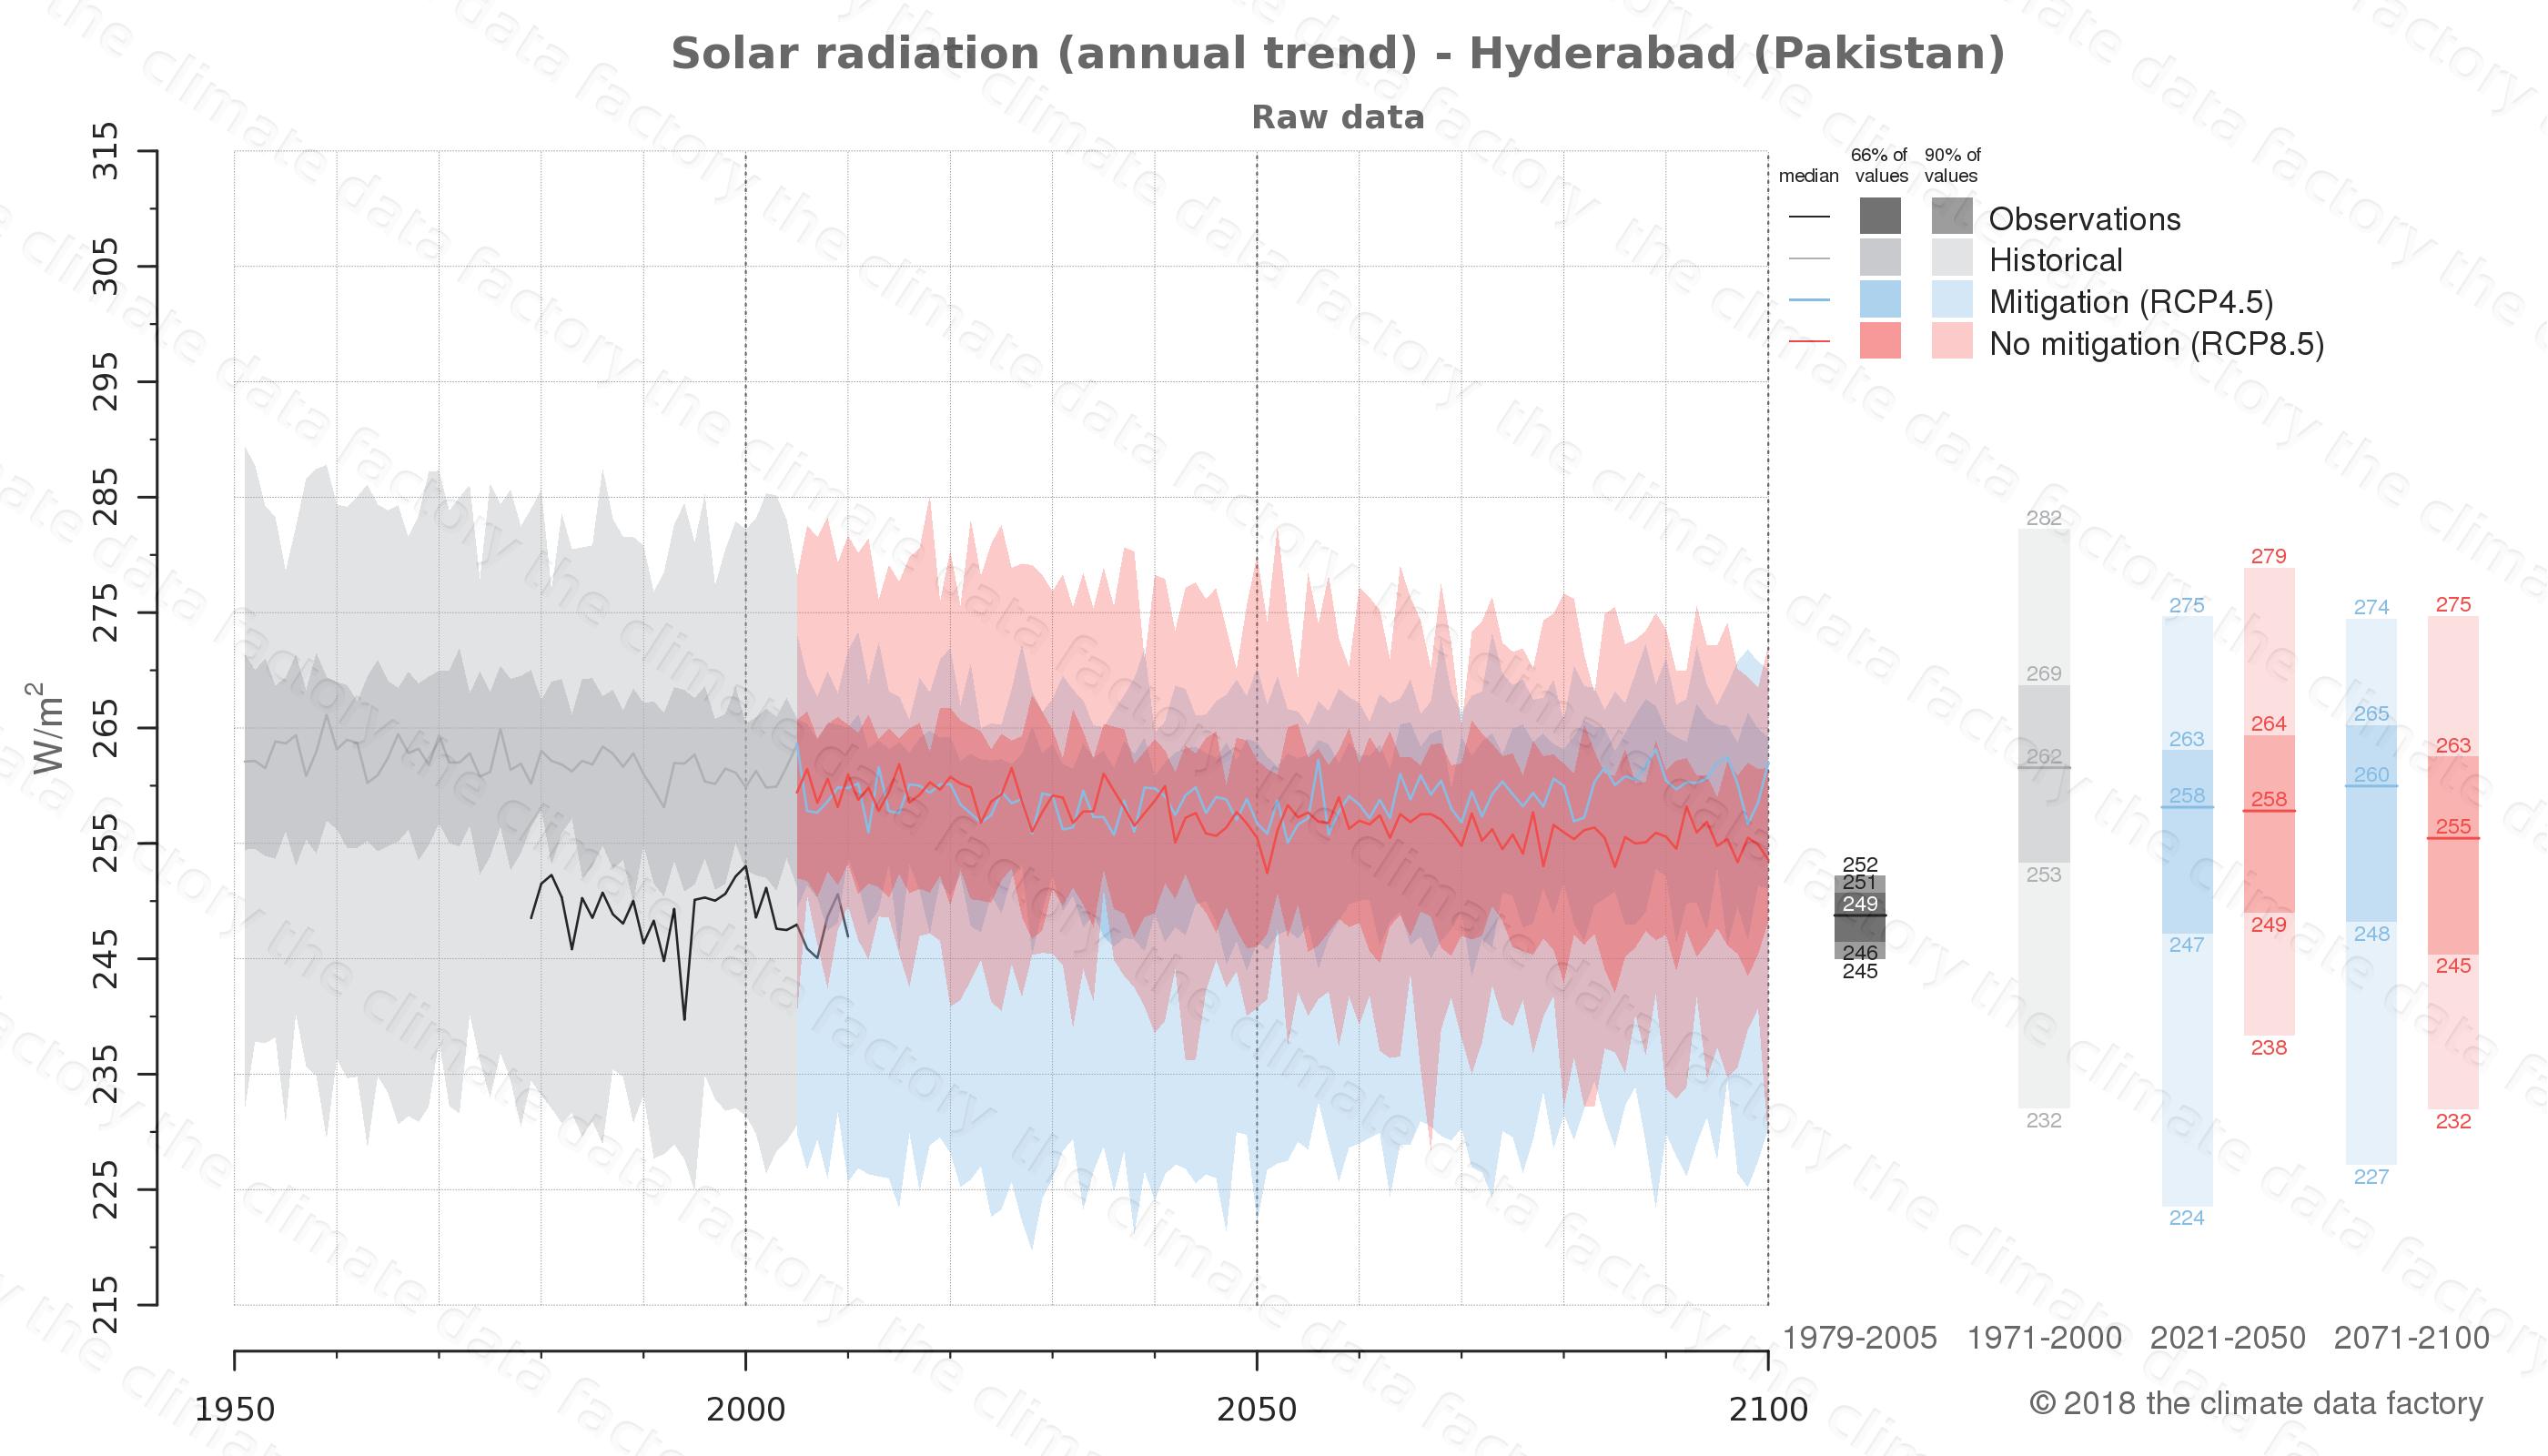 Solar radiation - Hyderabad (Pakistan)